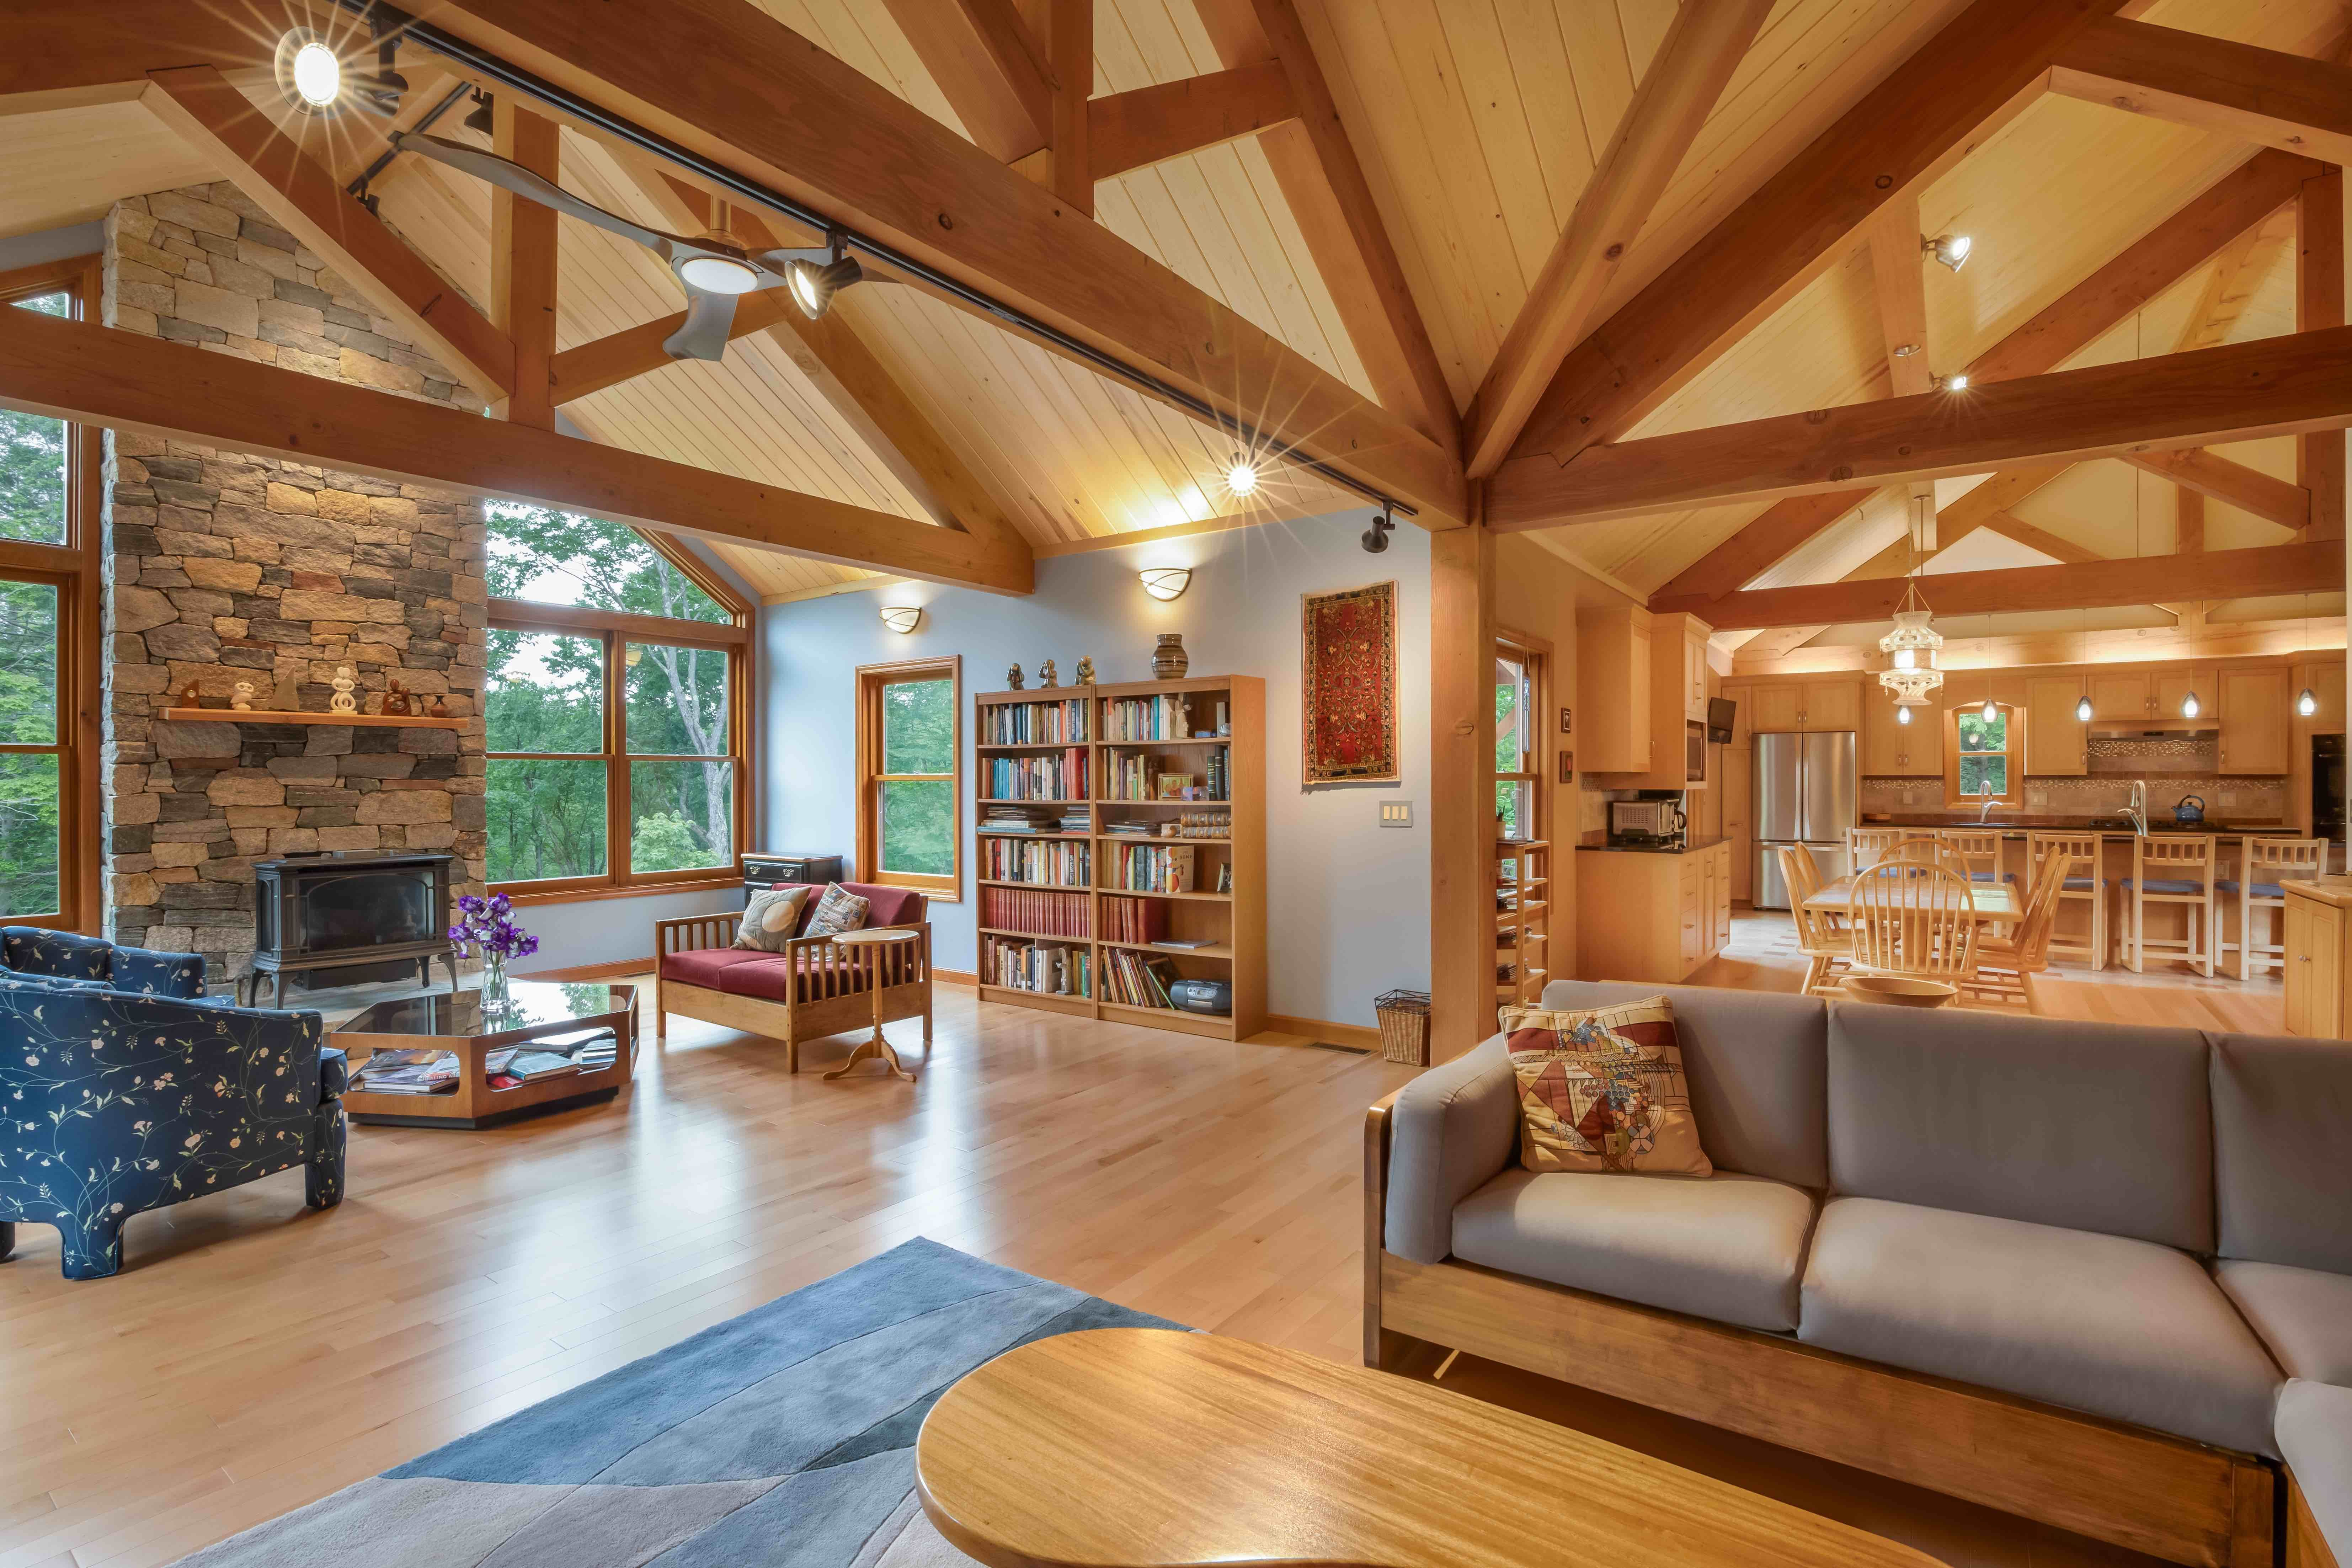 Single Story Post And Beam Granite Ridge Barn House Interior Single Story House Floor Plans Barn House Plans